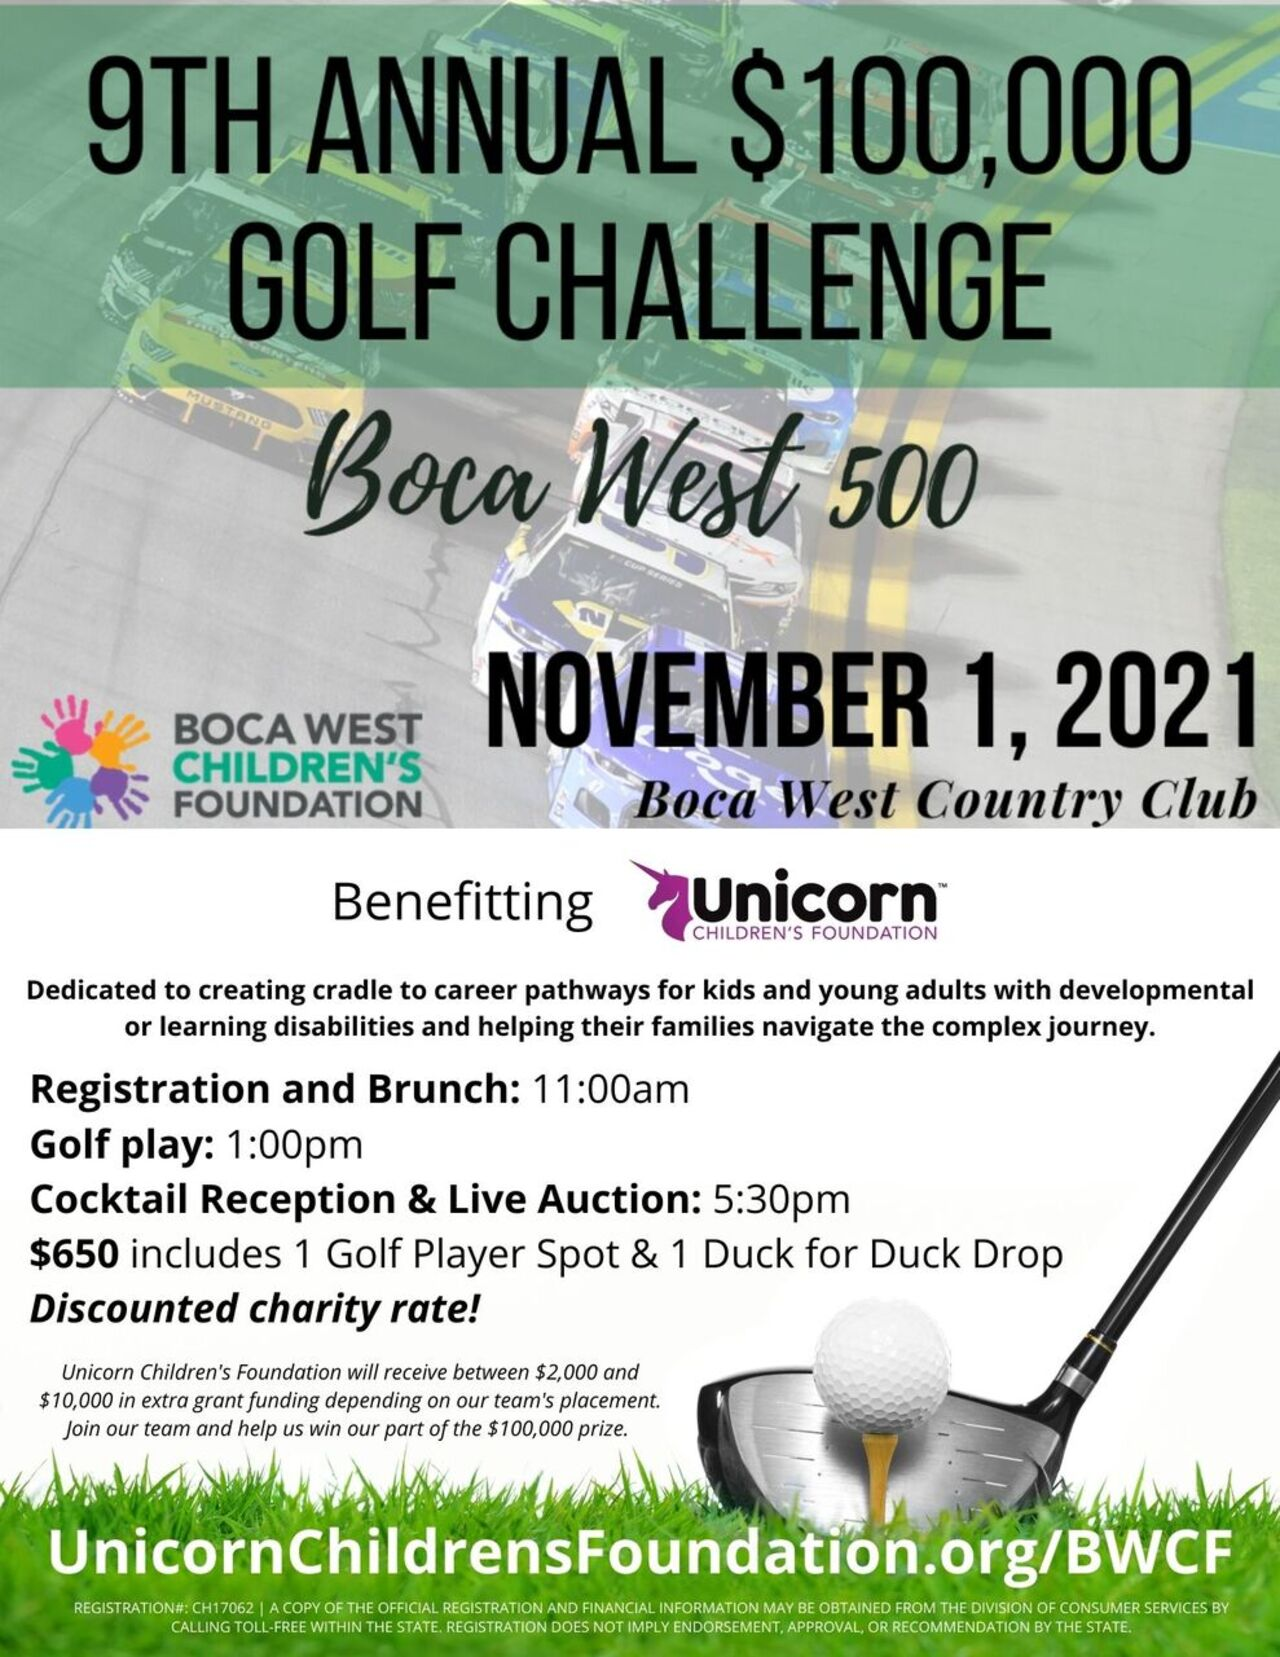 9th Annual $100,000 Golf Challenge